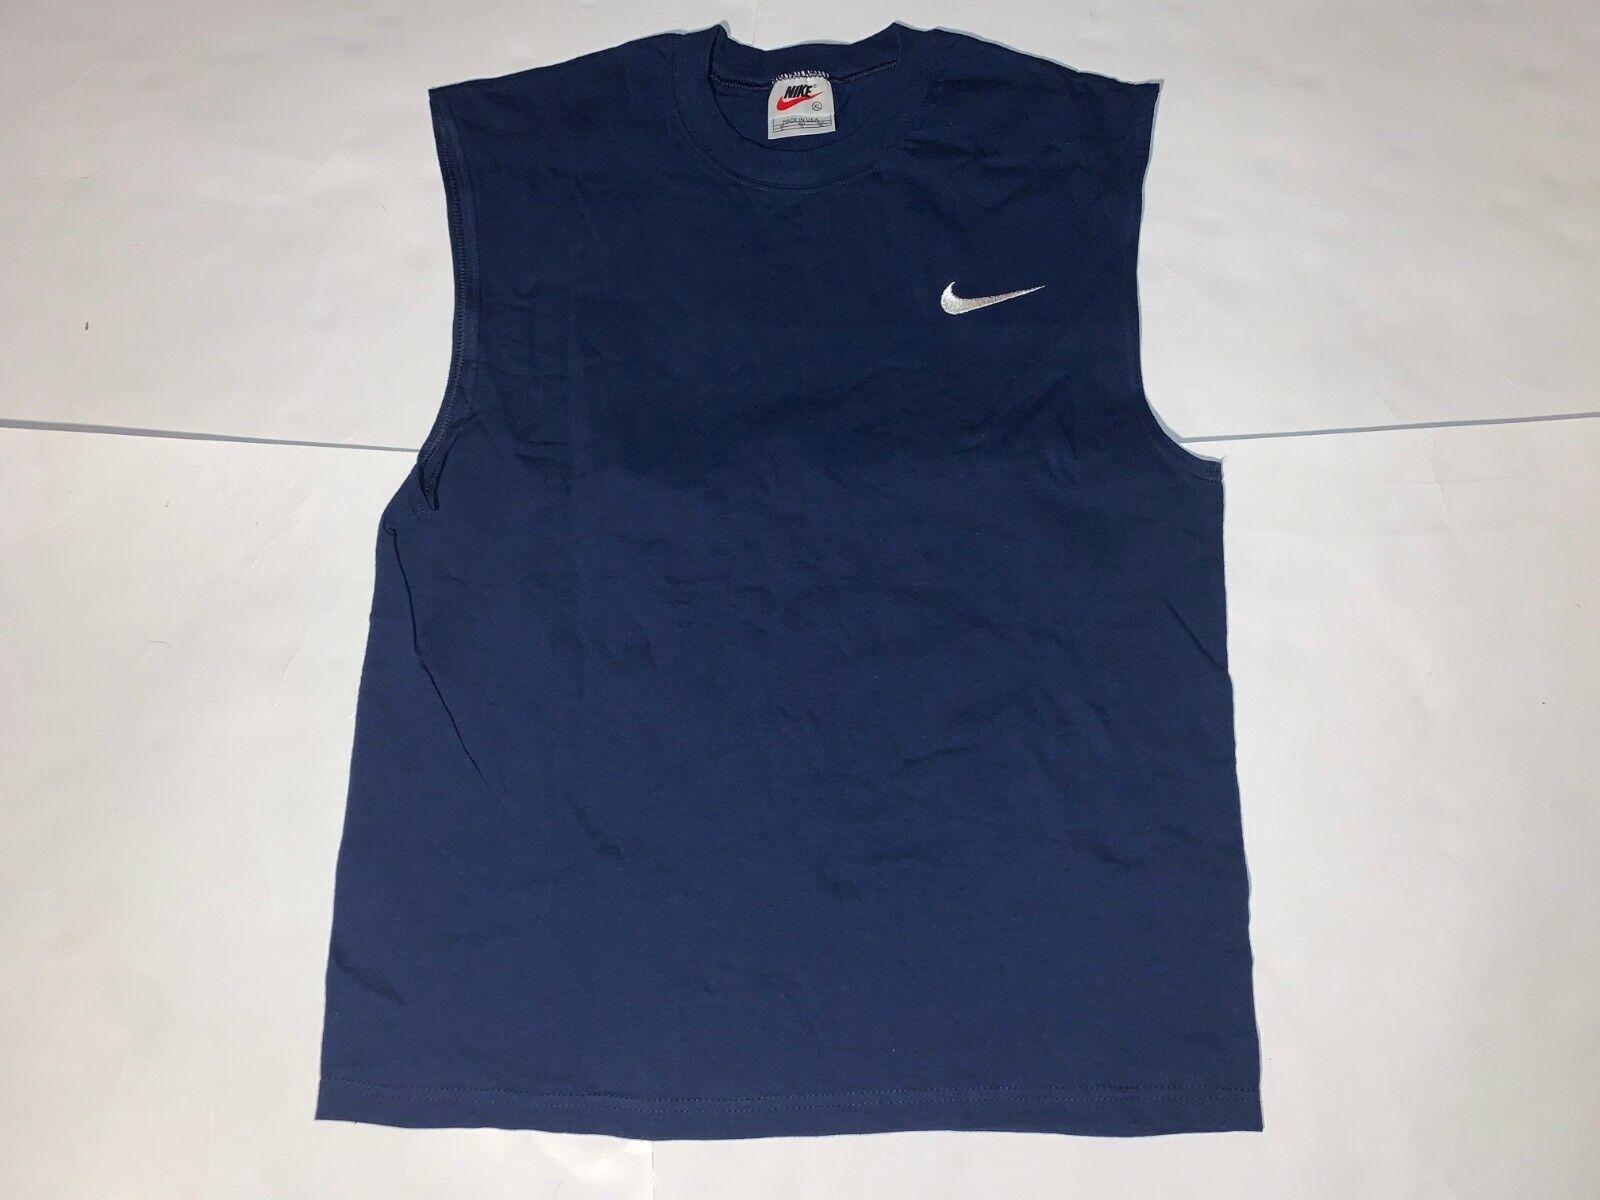 Vintage Bootleg Nike White Tag Cutoff T-Shirts (Youth XL/Adult Small)